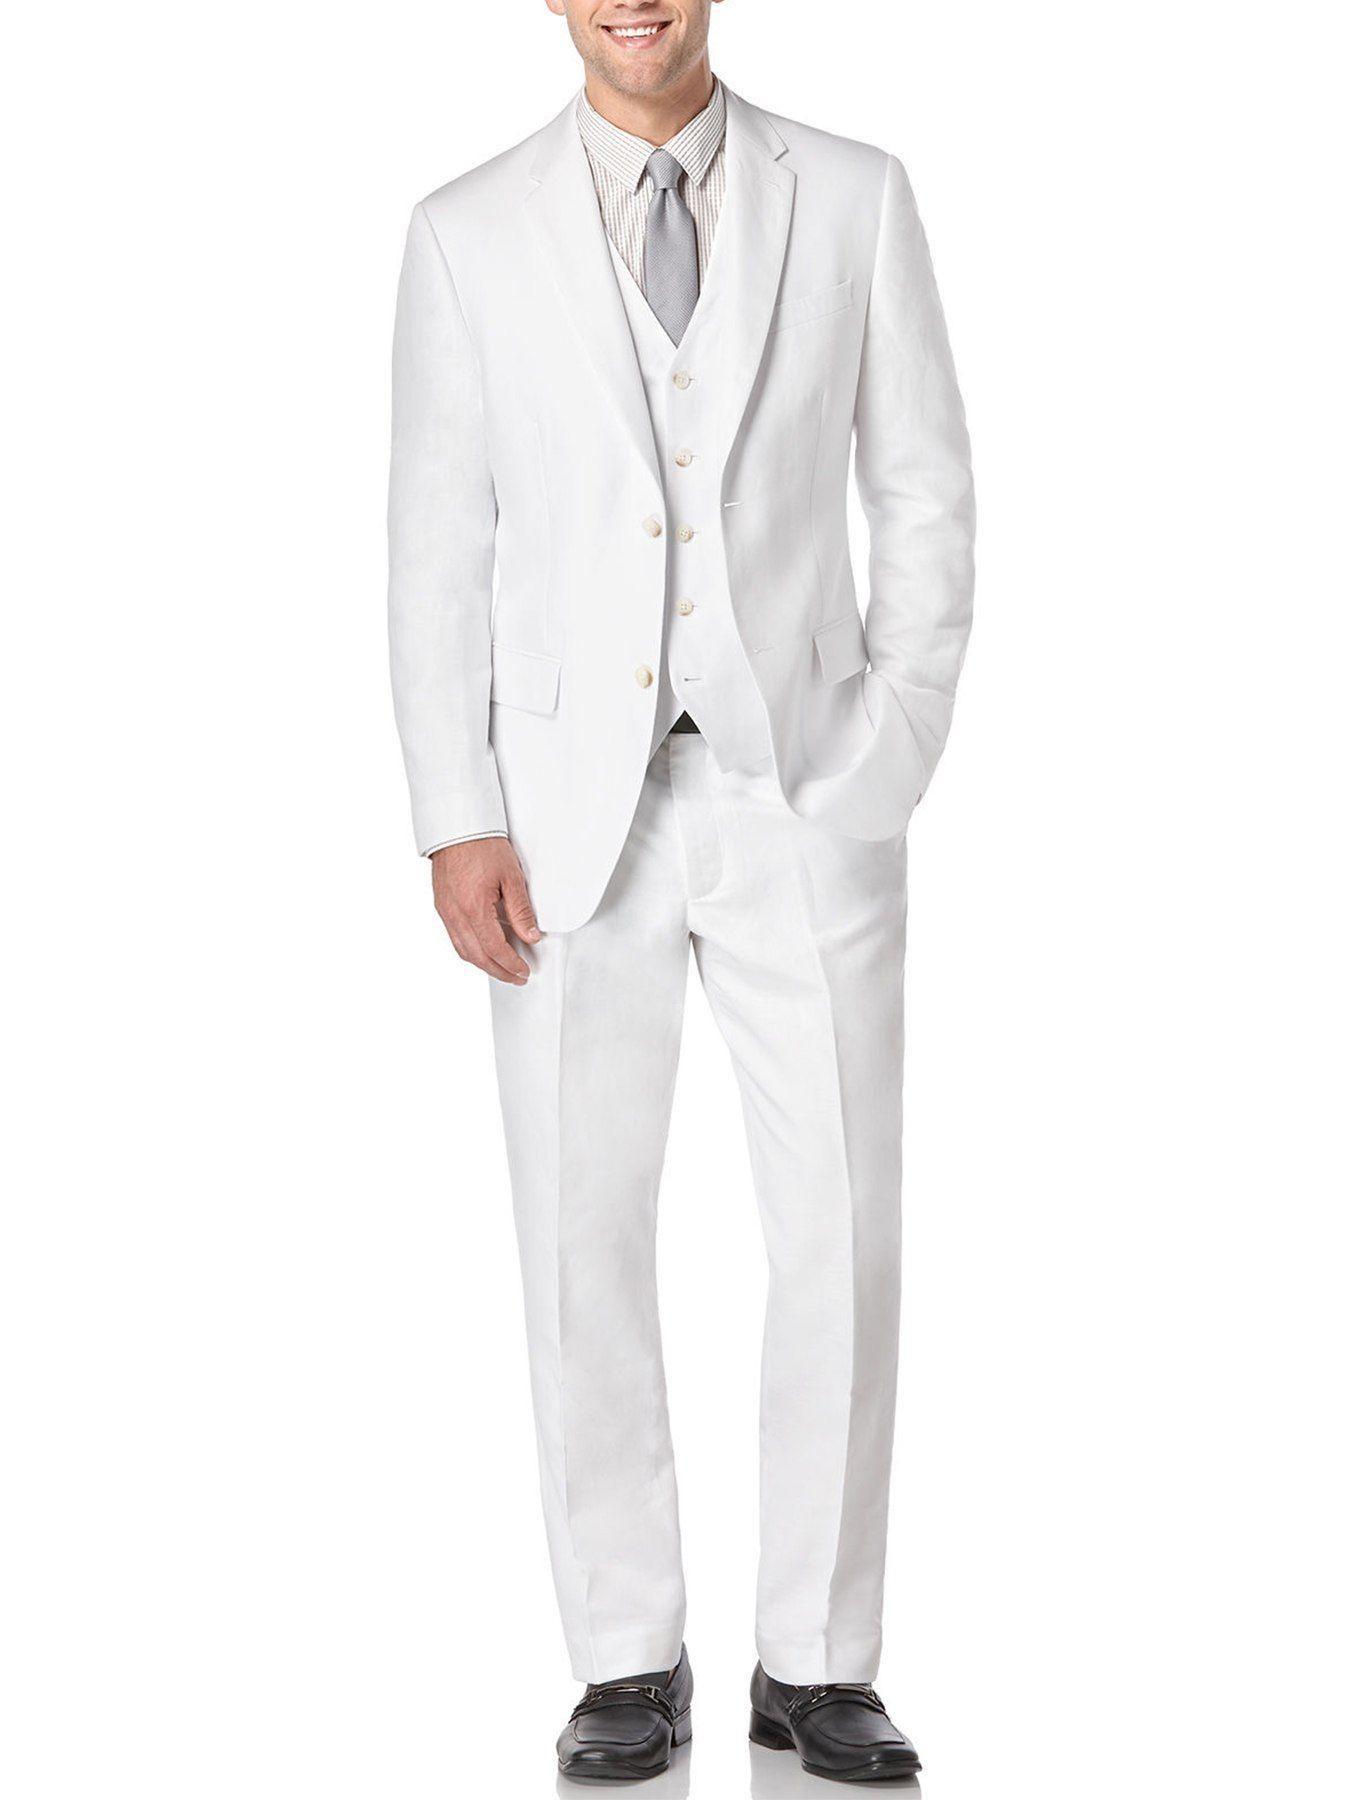 Big Tall Linen Twill Suit Jacket Future Wedding Suit Jacket